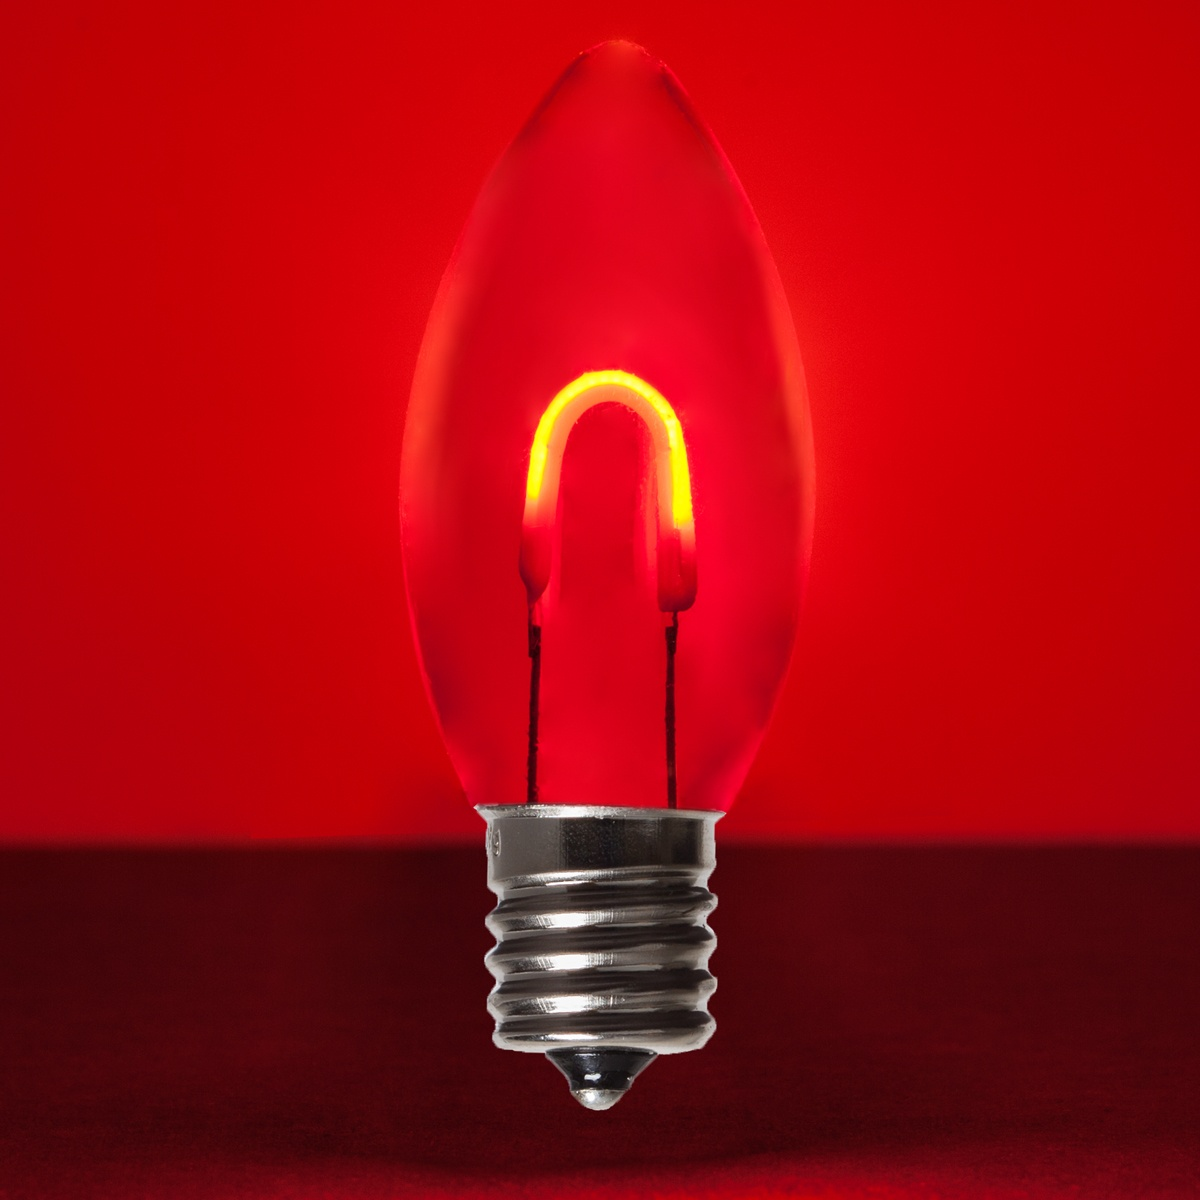 c9 red acrylic flexfilament tm led vintage christmas light bulb transparent. Black Bedroom Furniture Sets. Home Design Ideas